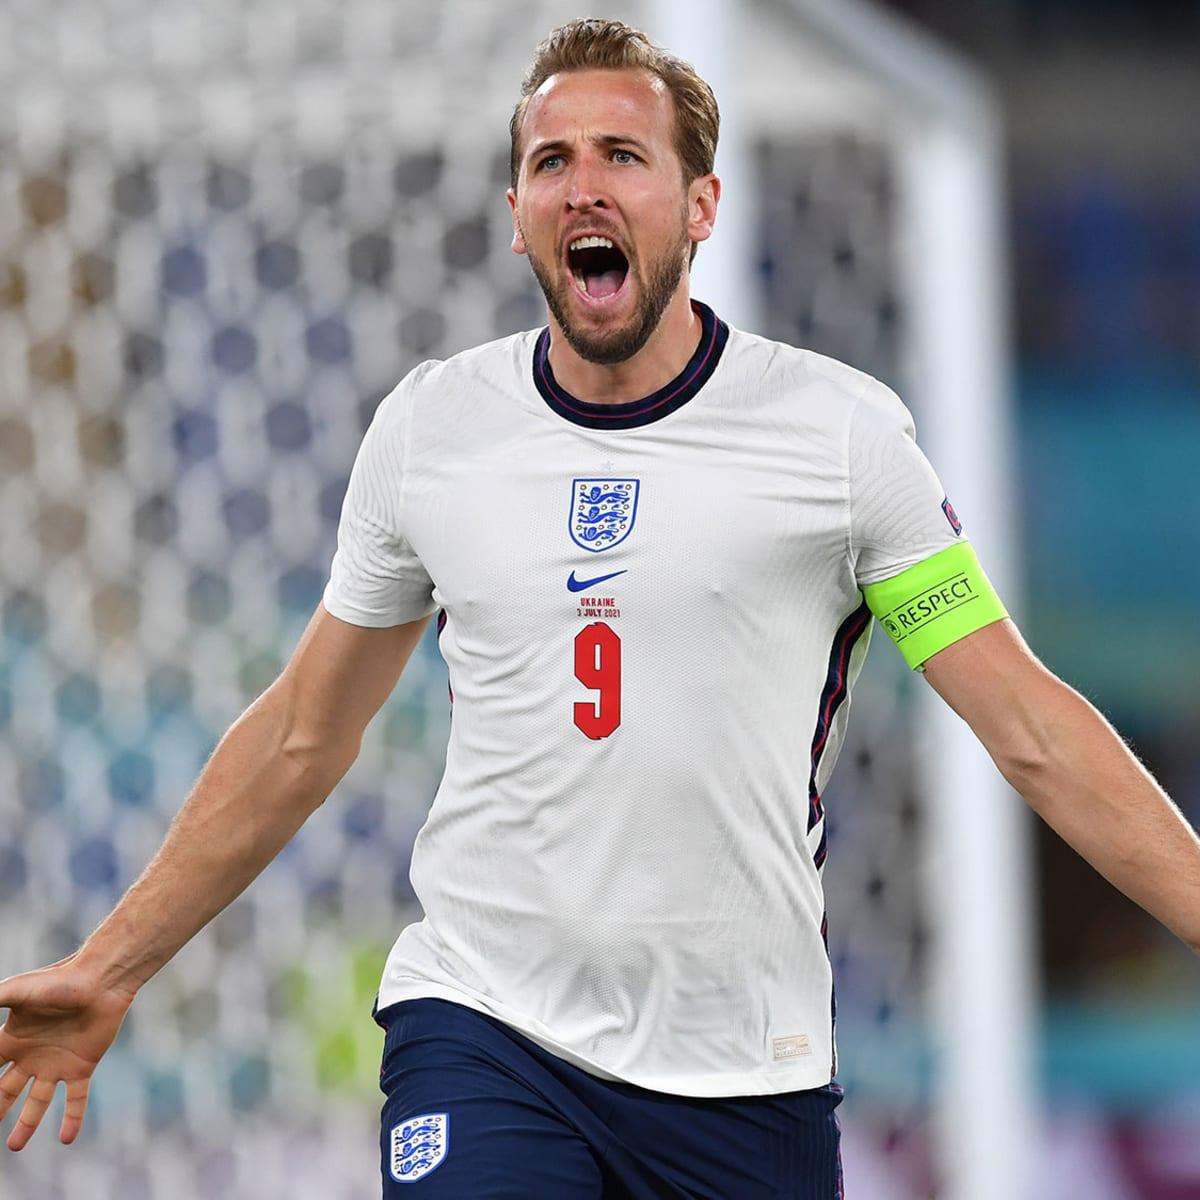 England Thrashes Ukraine Rest Of Euro 2020 Set Up At Home Sports Illustrated